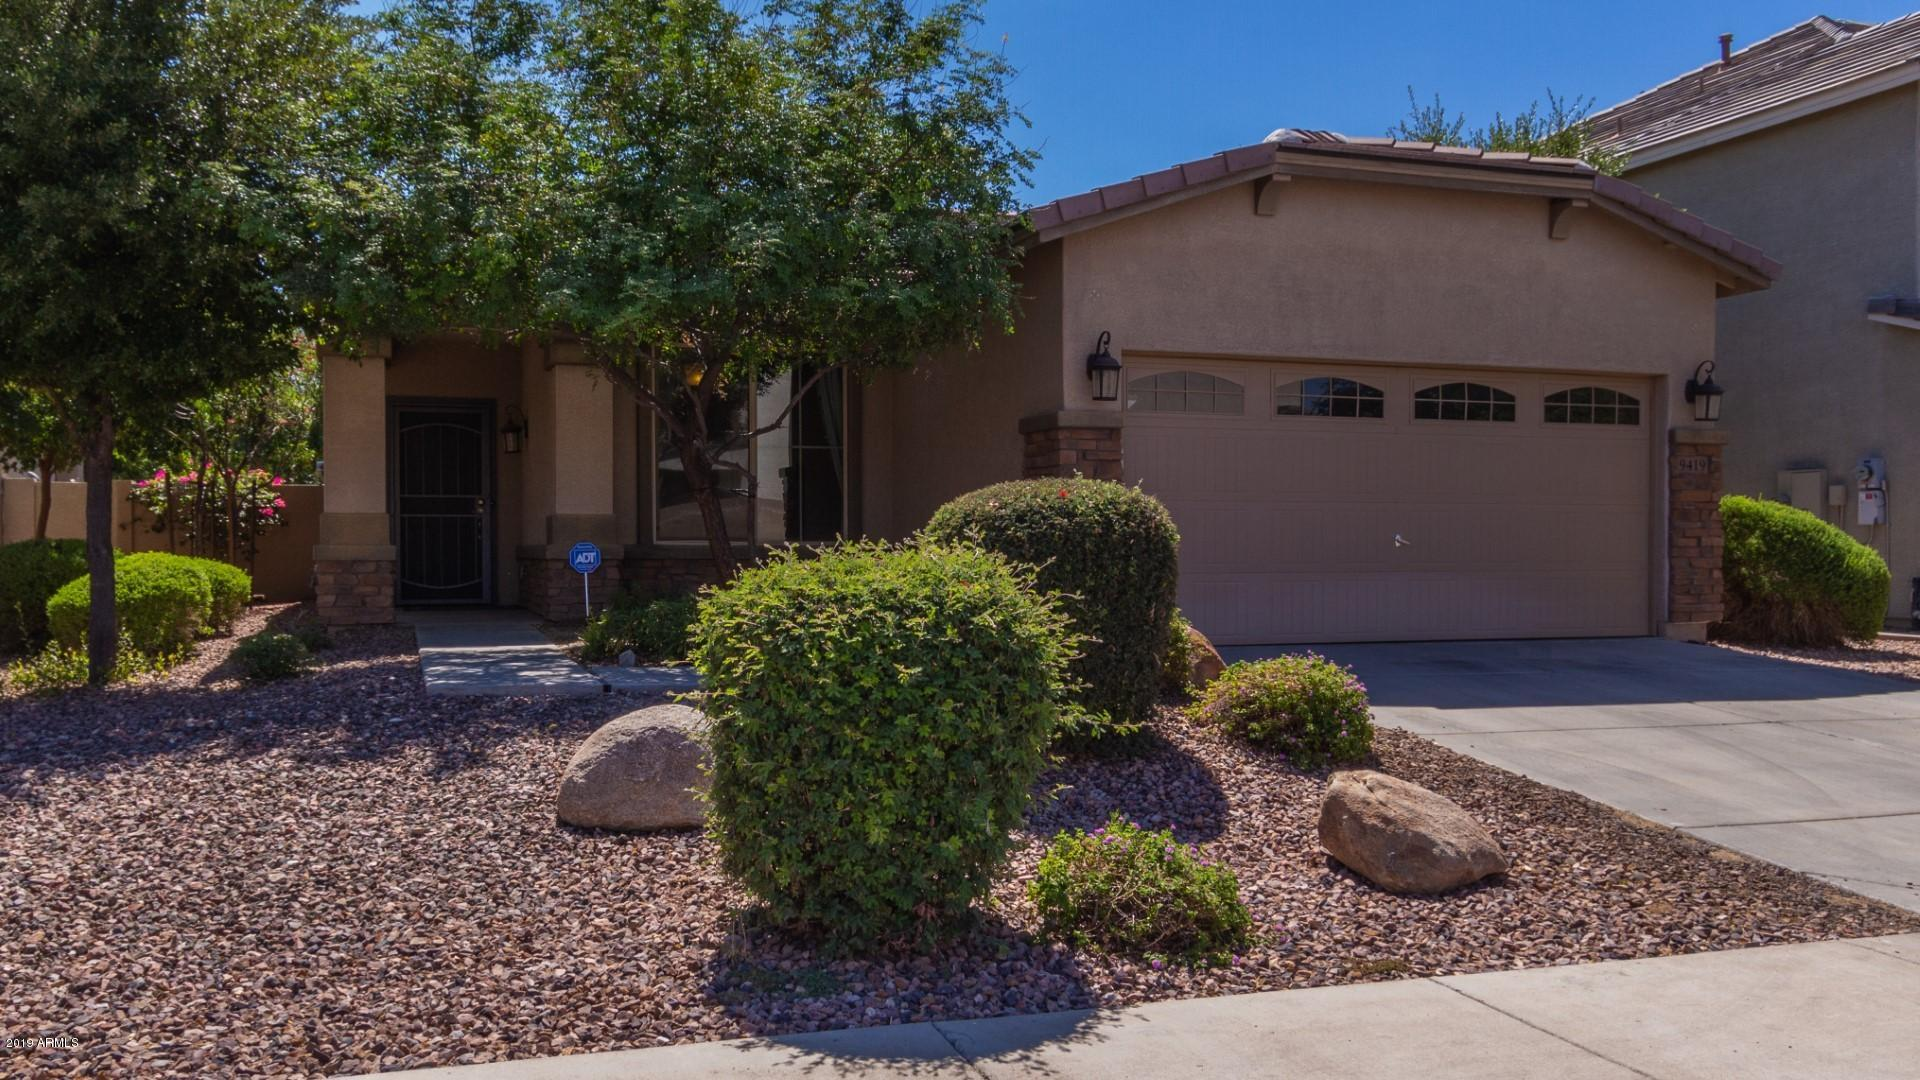 Photo of 9419 N 183RD Lane, Waddell, AZ 85355